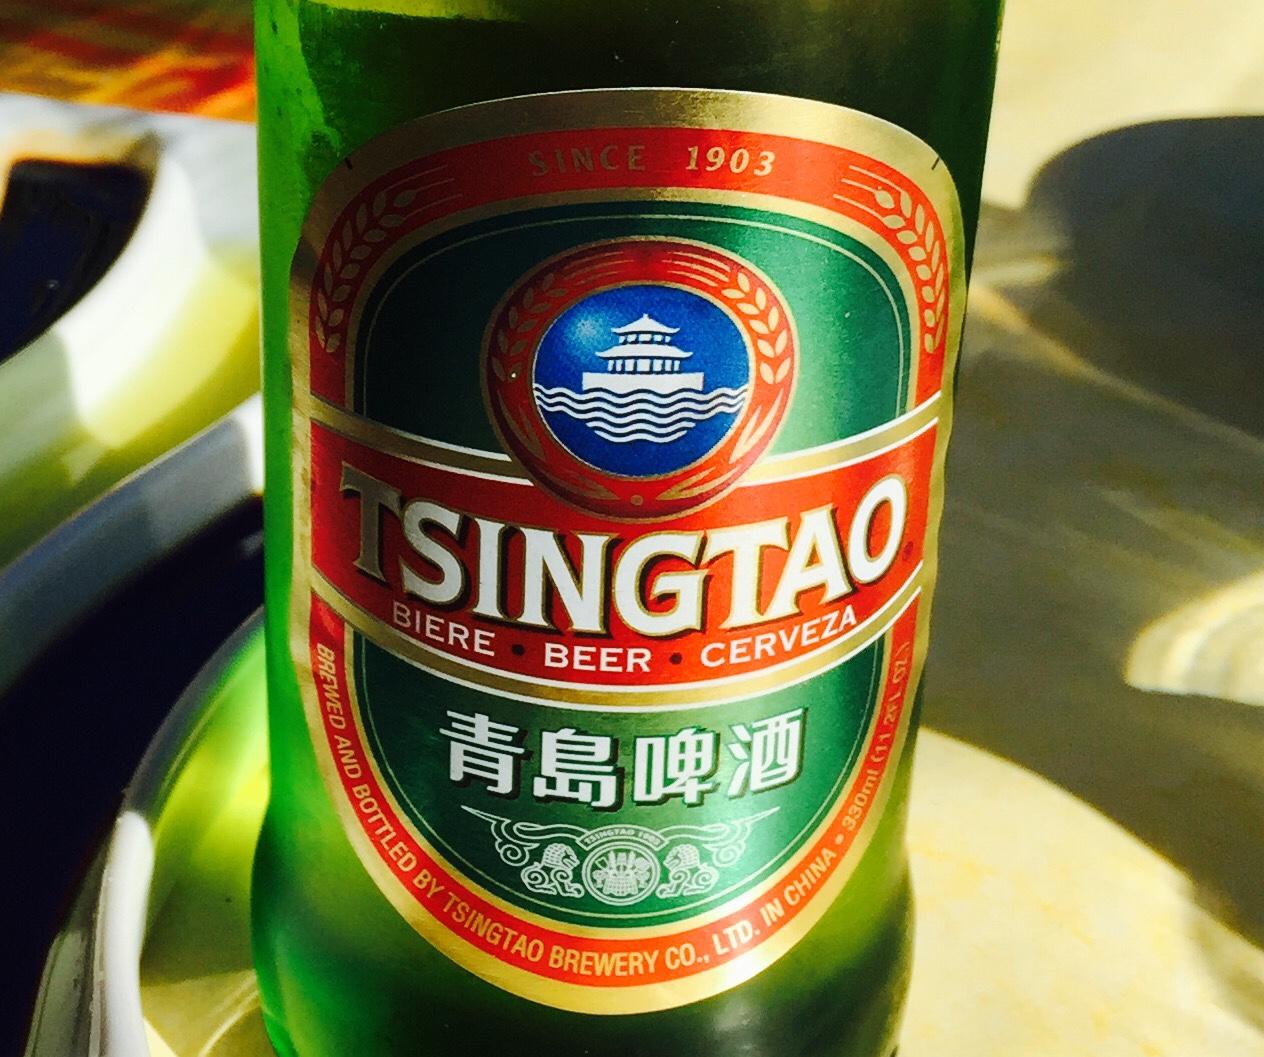 Tsingtao - Lager